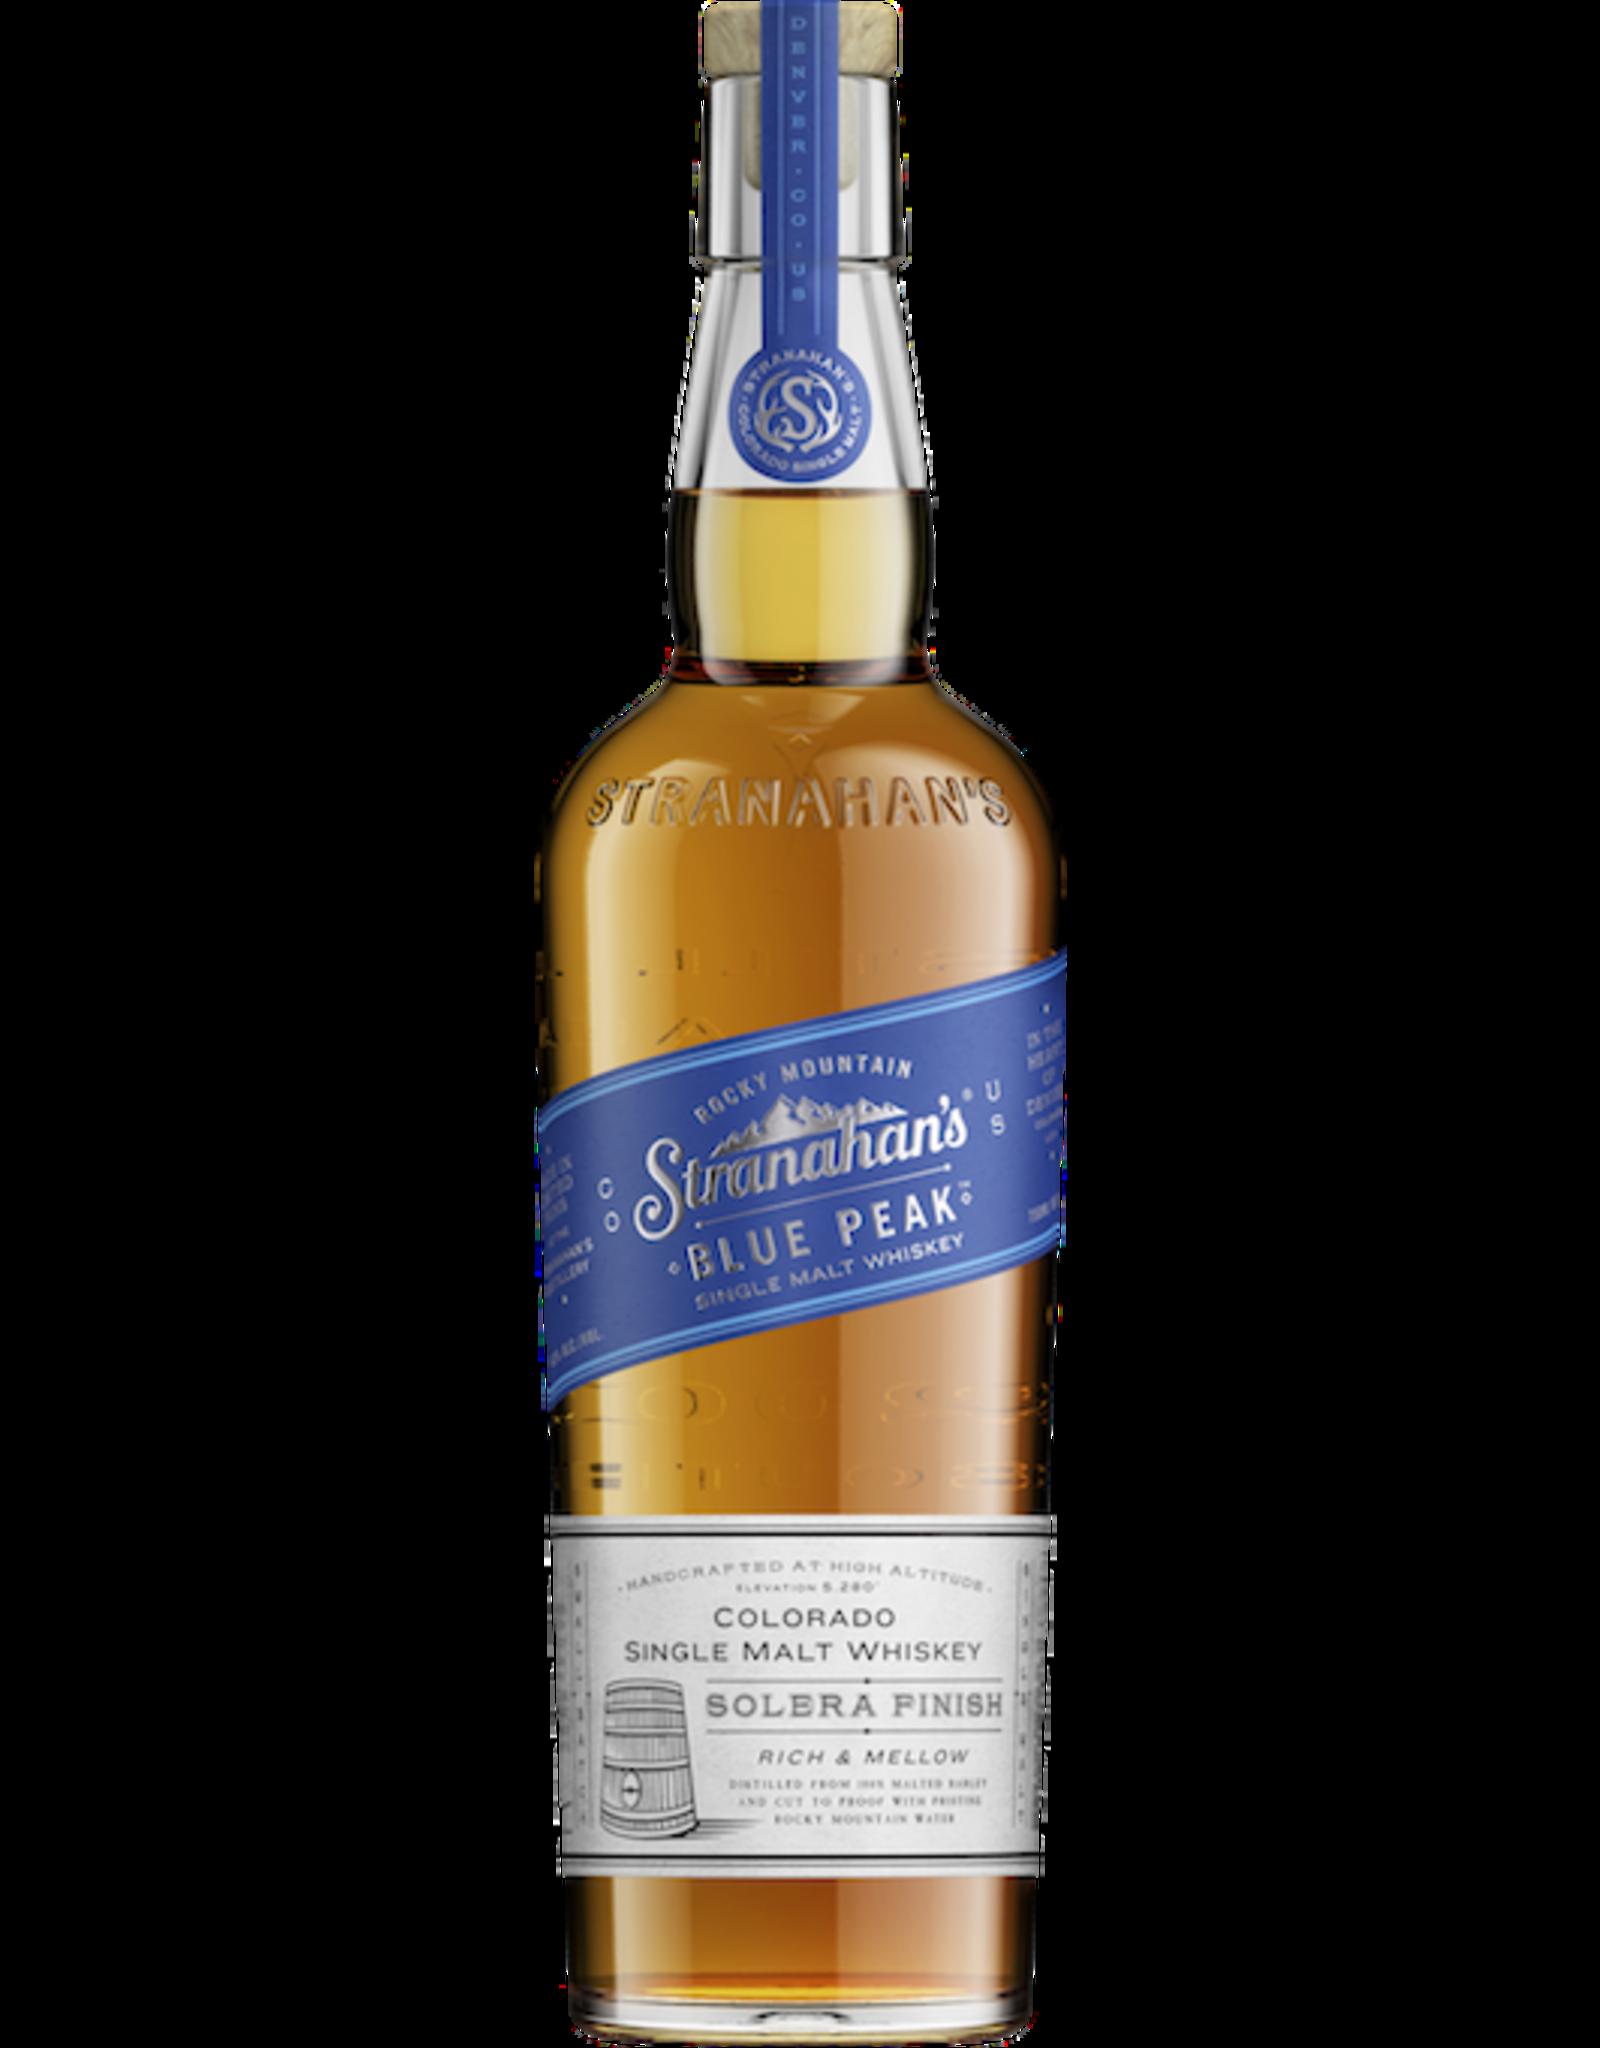 Stranahan's Blue Peak Single Malt Whiskey